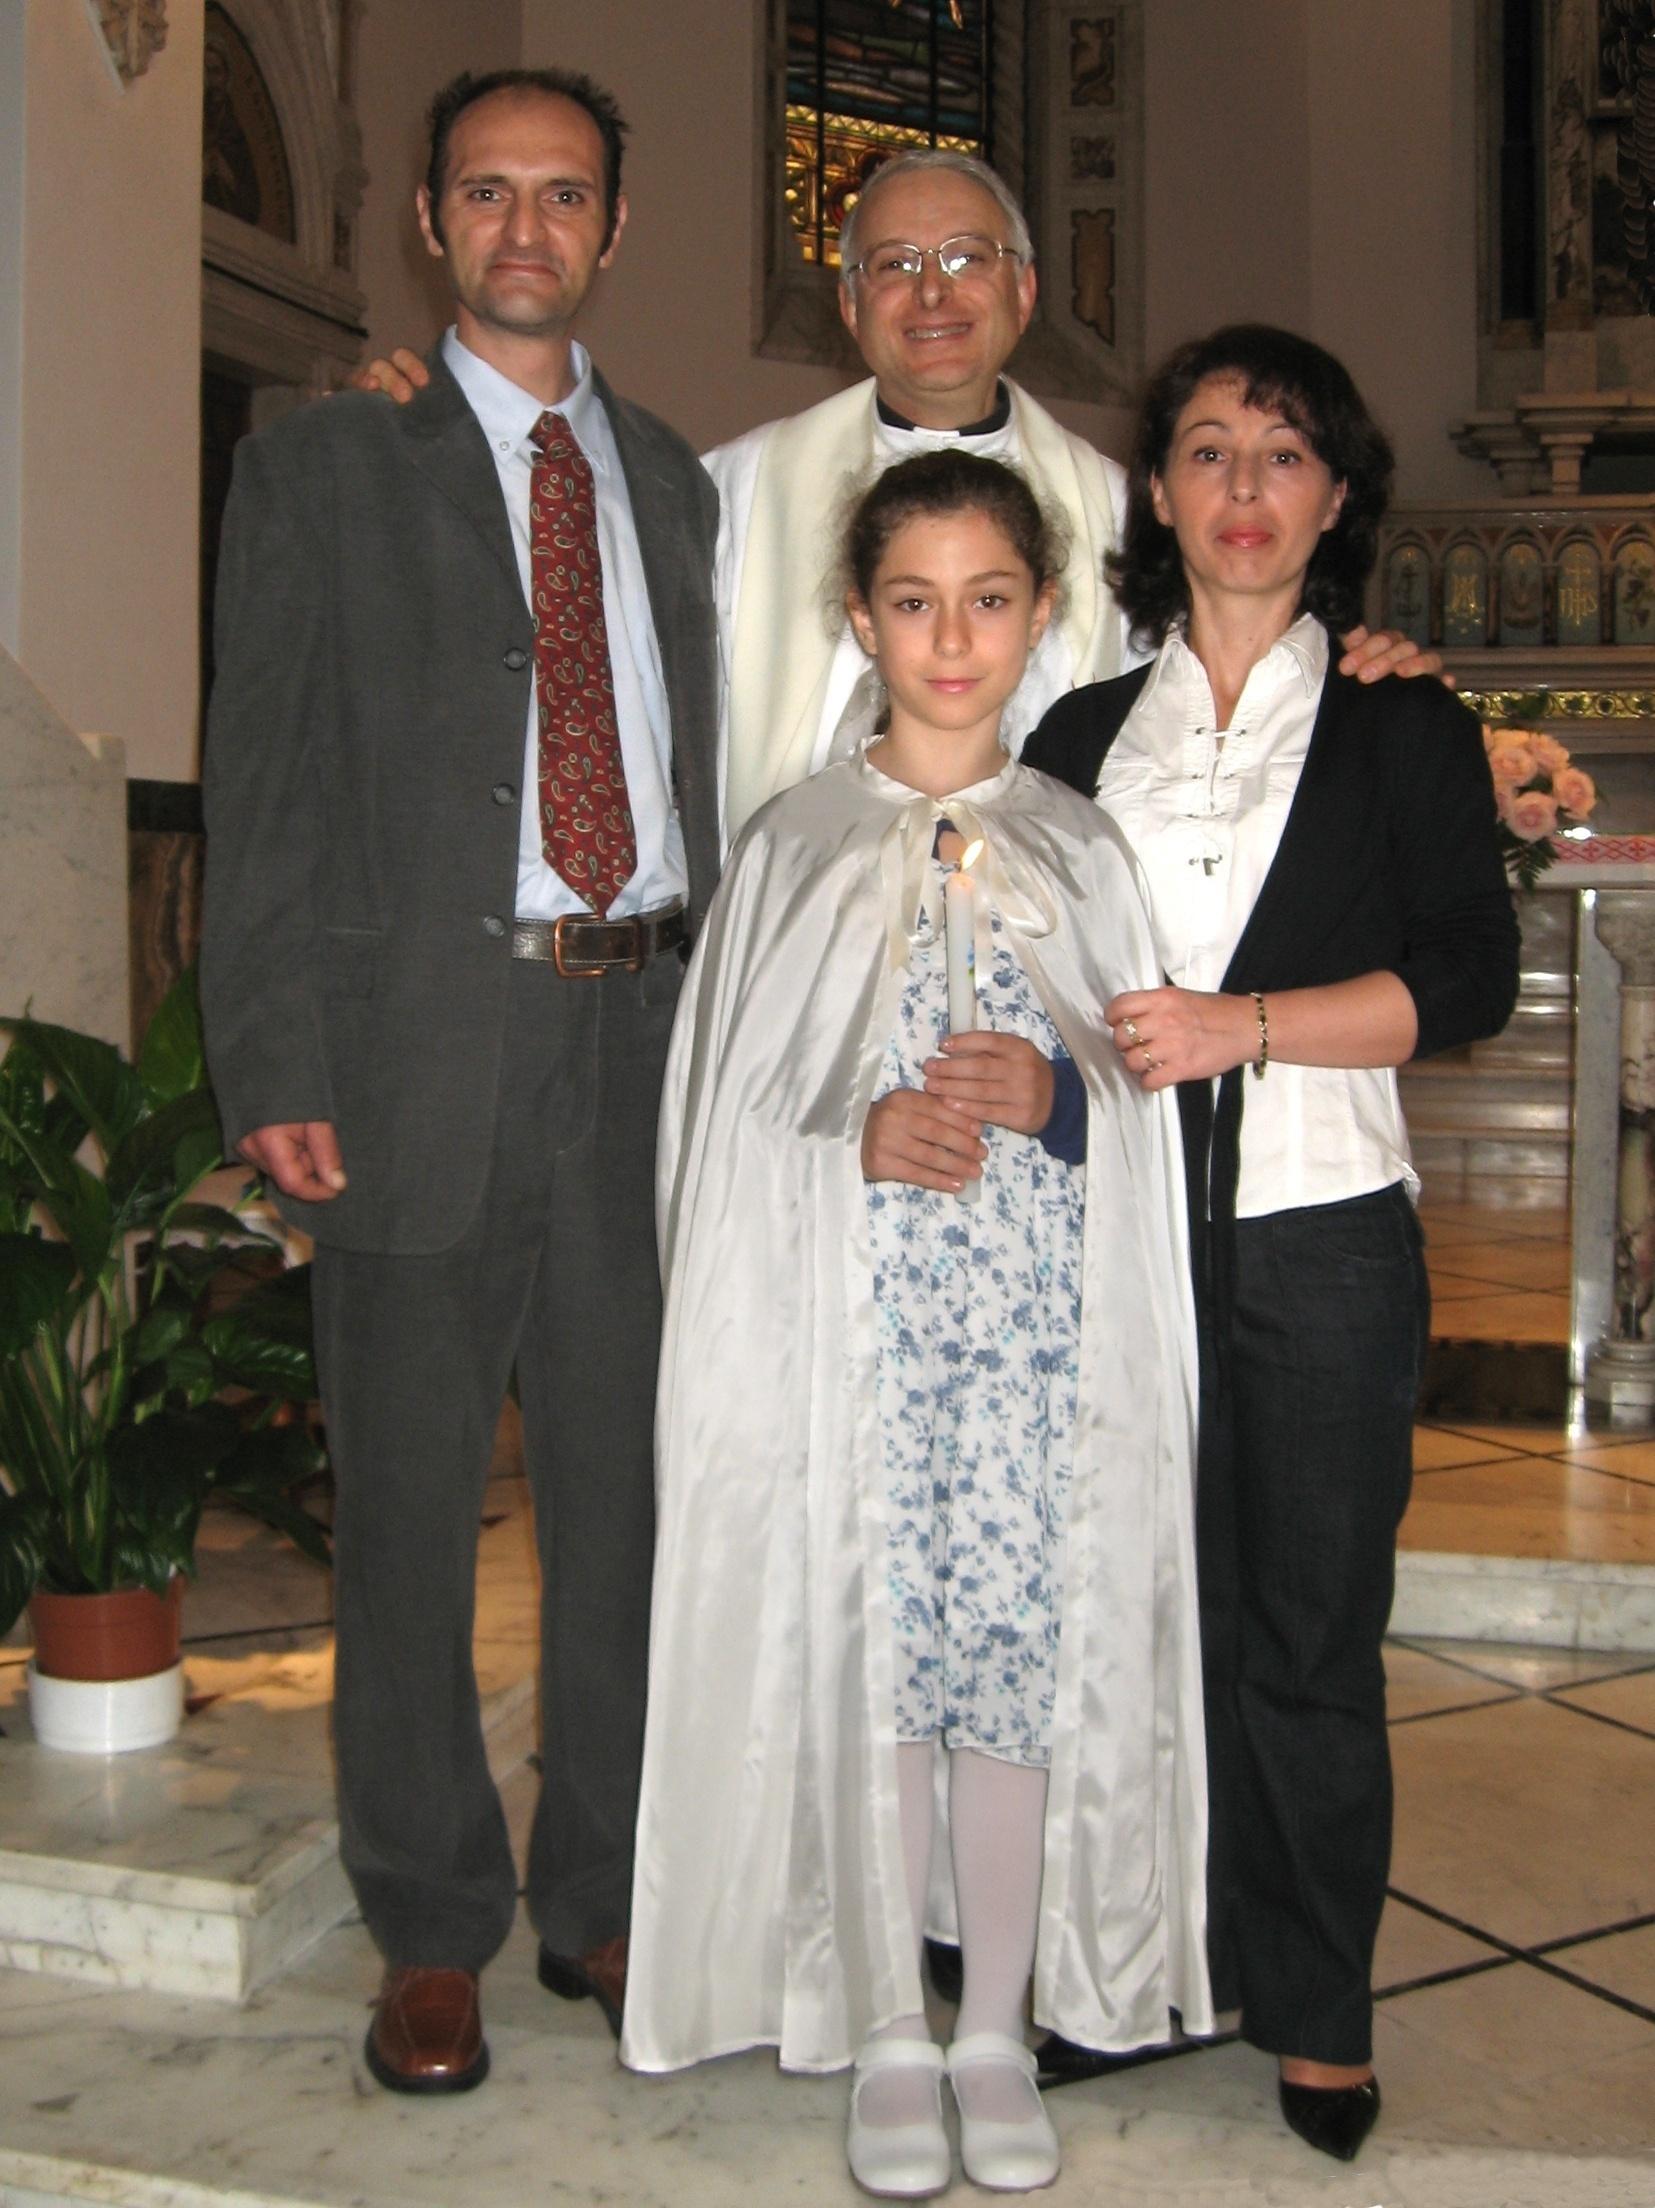 Battesimo_Jasmine_Romagnolo_10-05-22--11.28.24